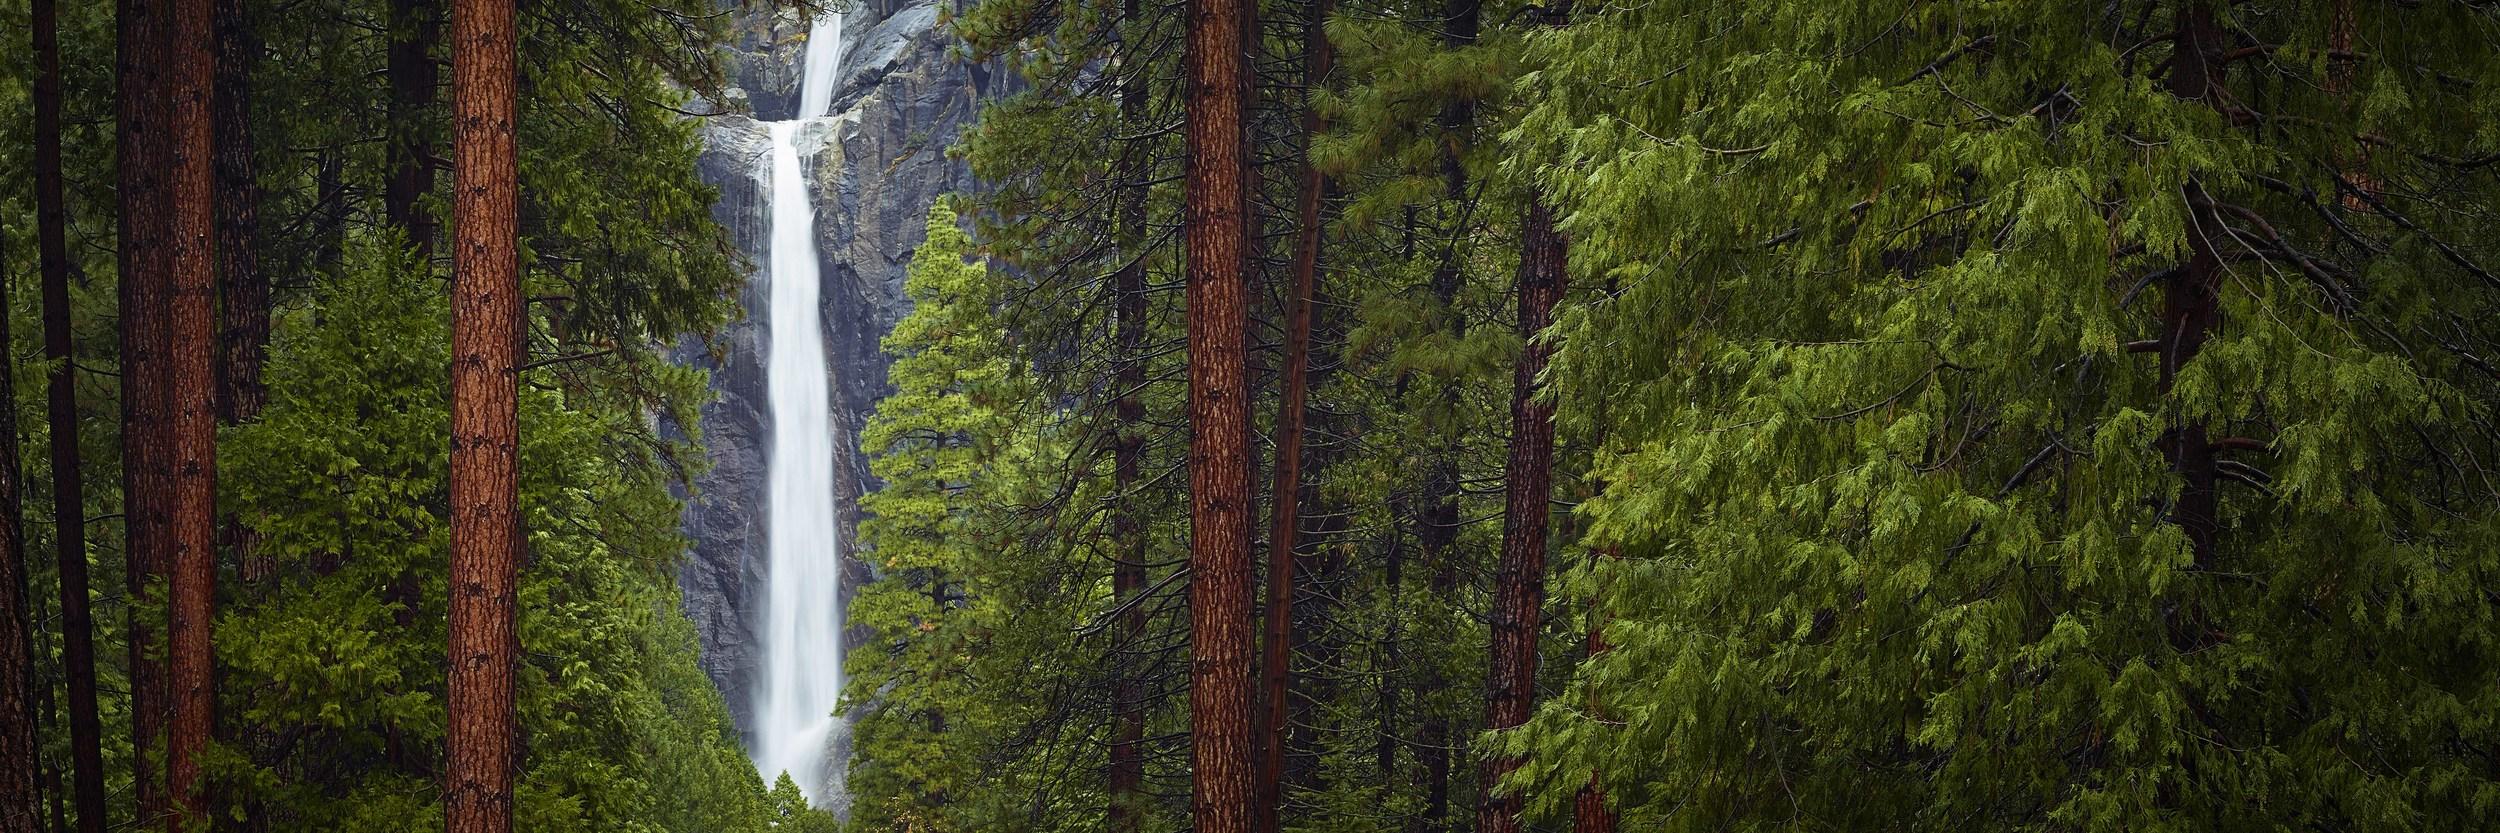 COUNCIL - Yosemite National Park, California